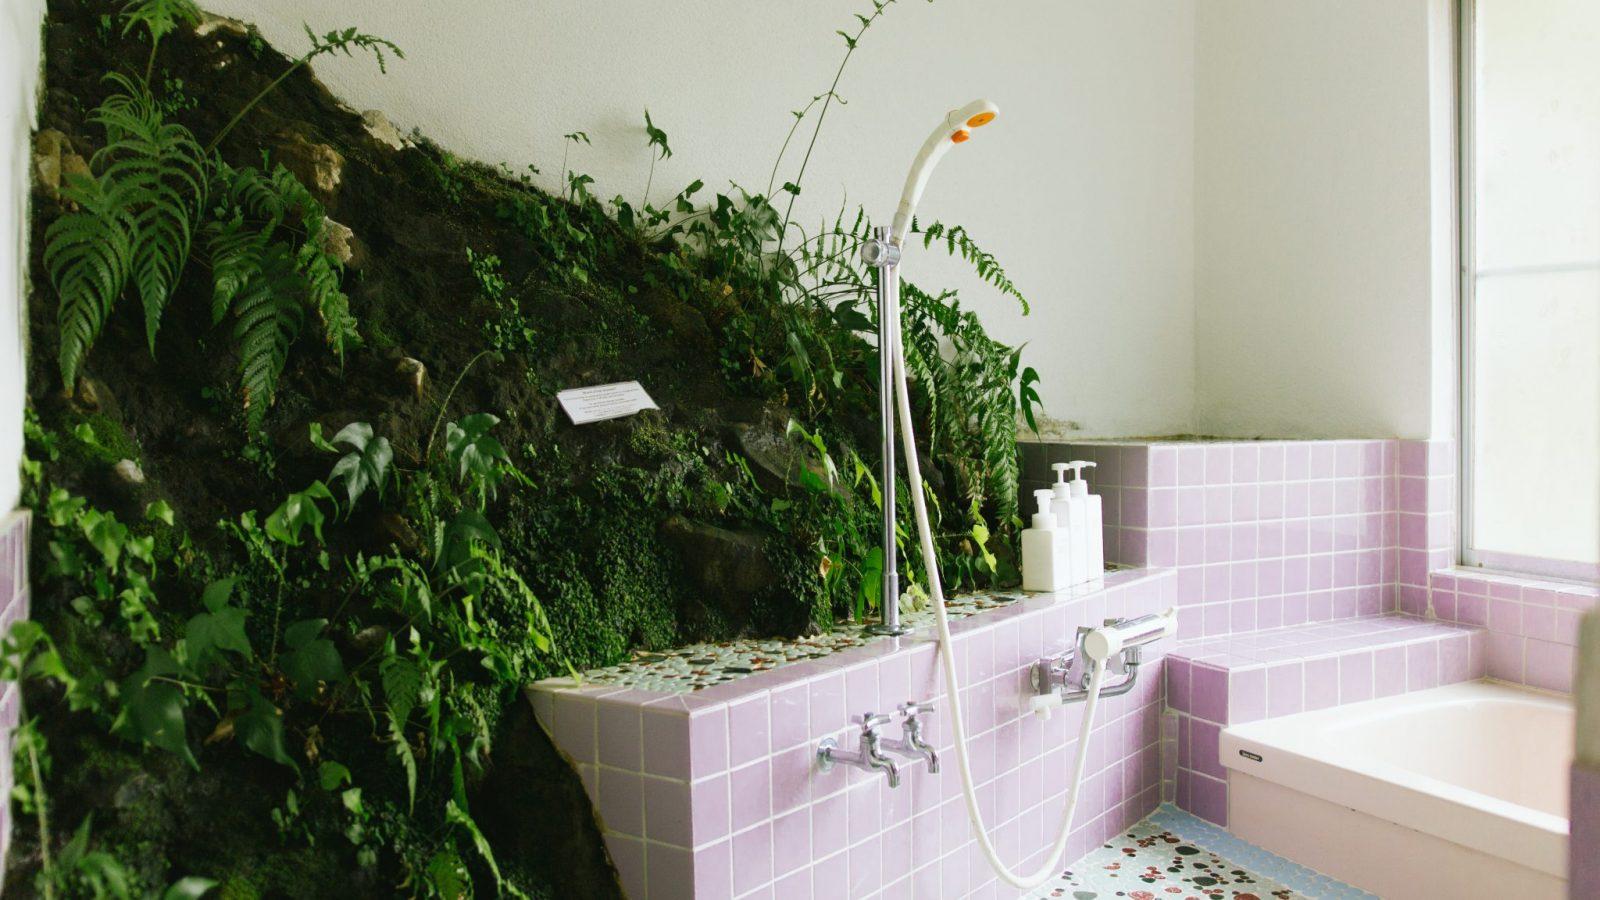 Shower room at Retreat wabi-sabi